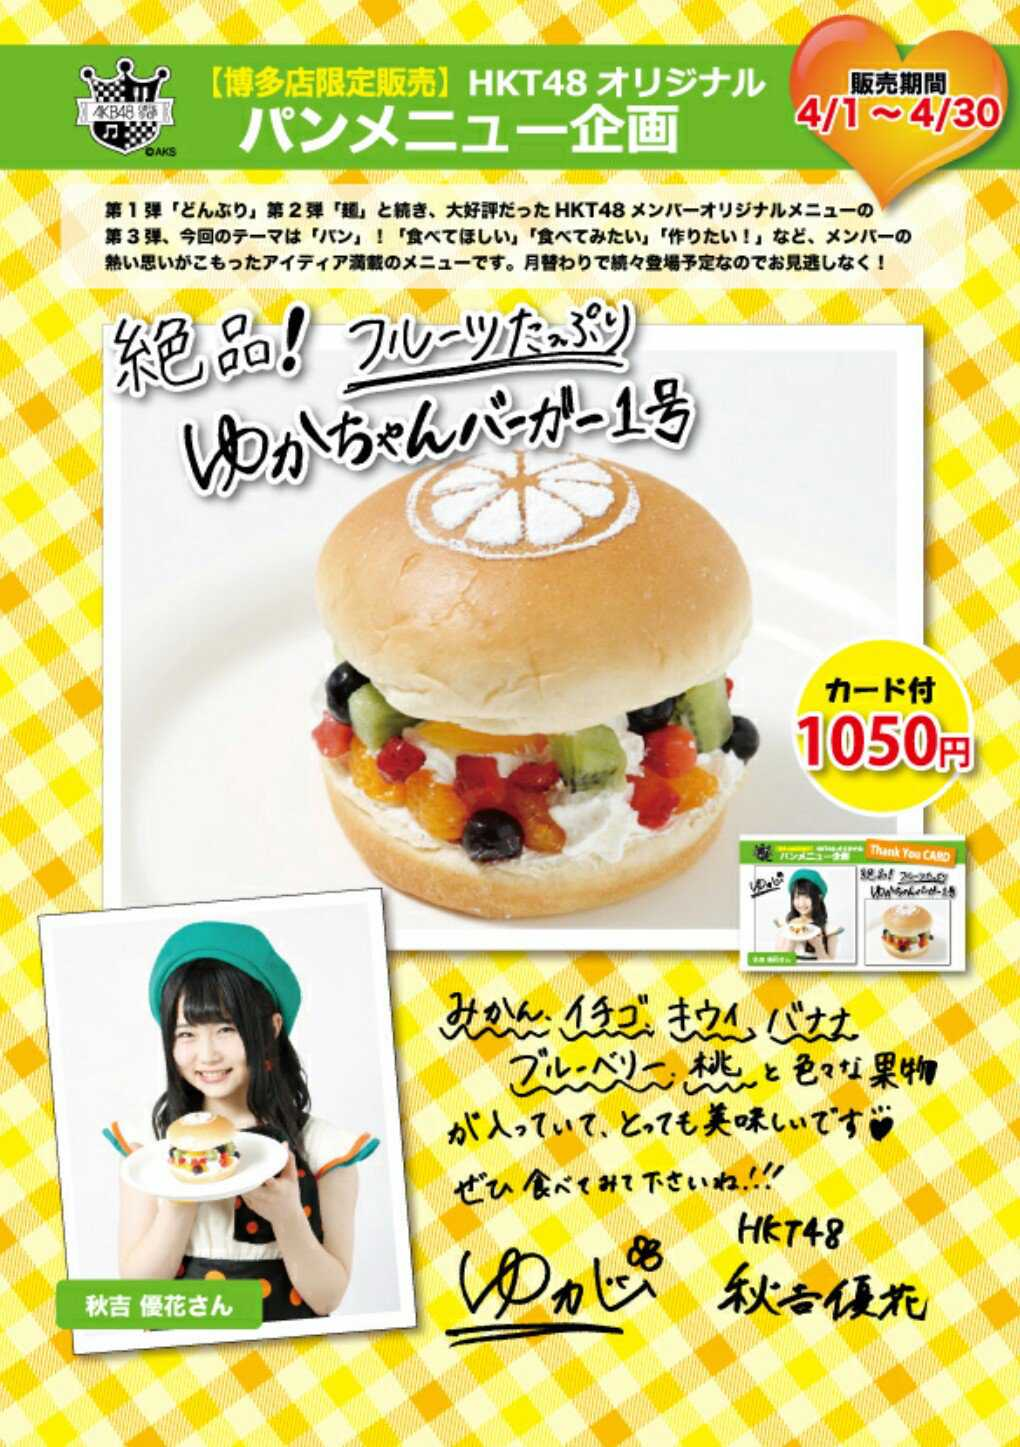 yukachan burger